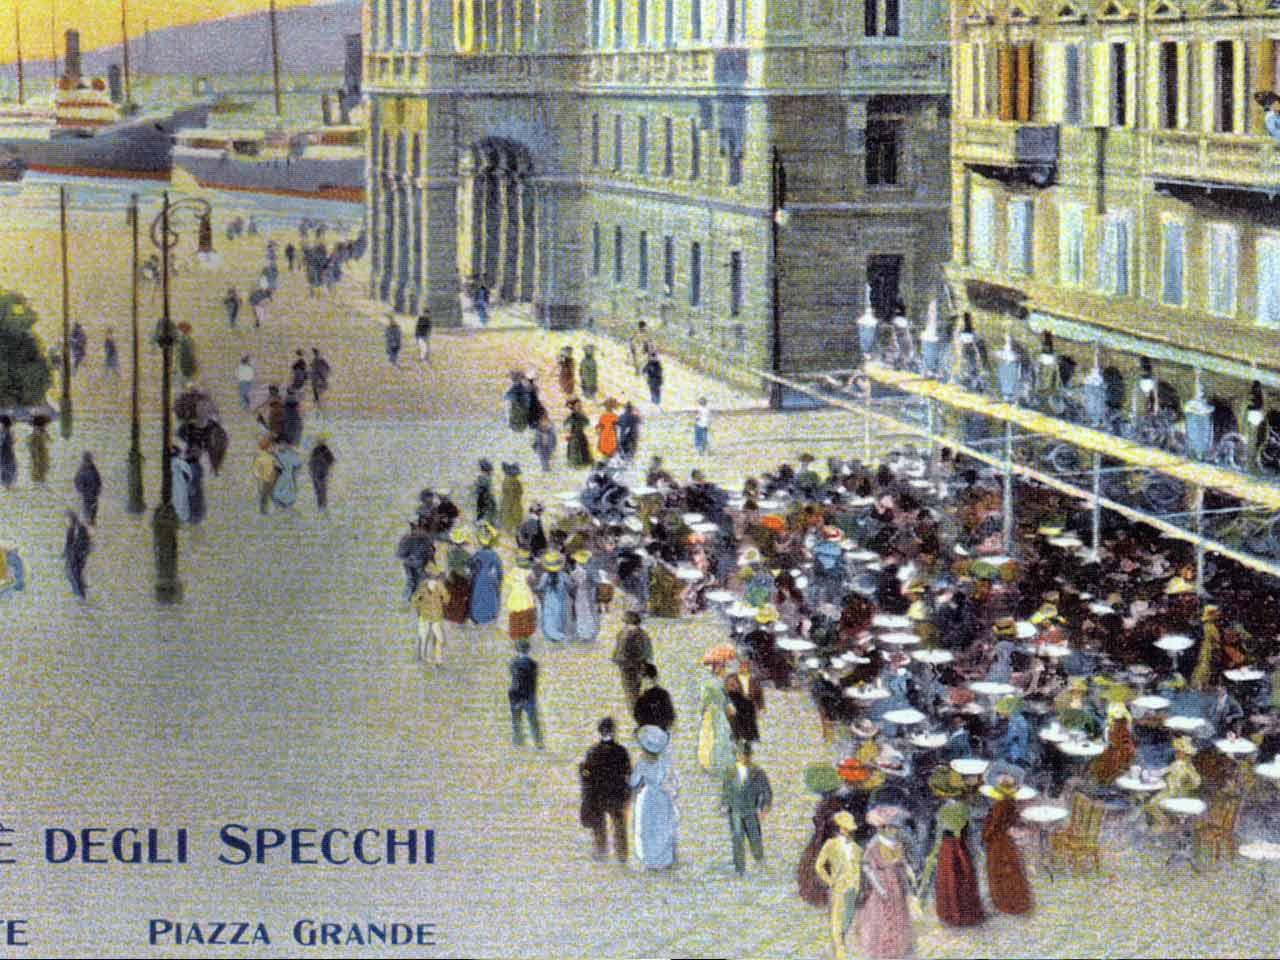 A tour of trieste s historical caf s missclaire - Caffe degli specchi ...